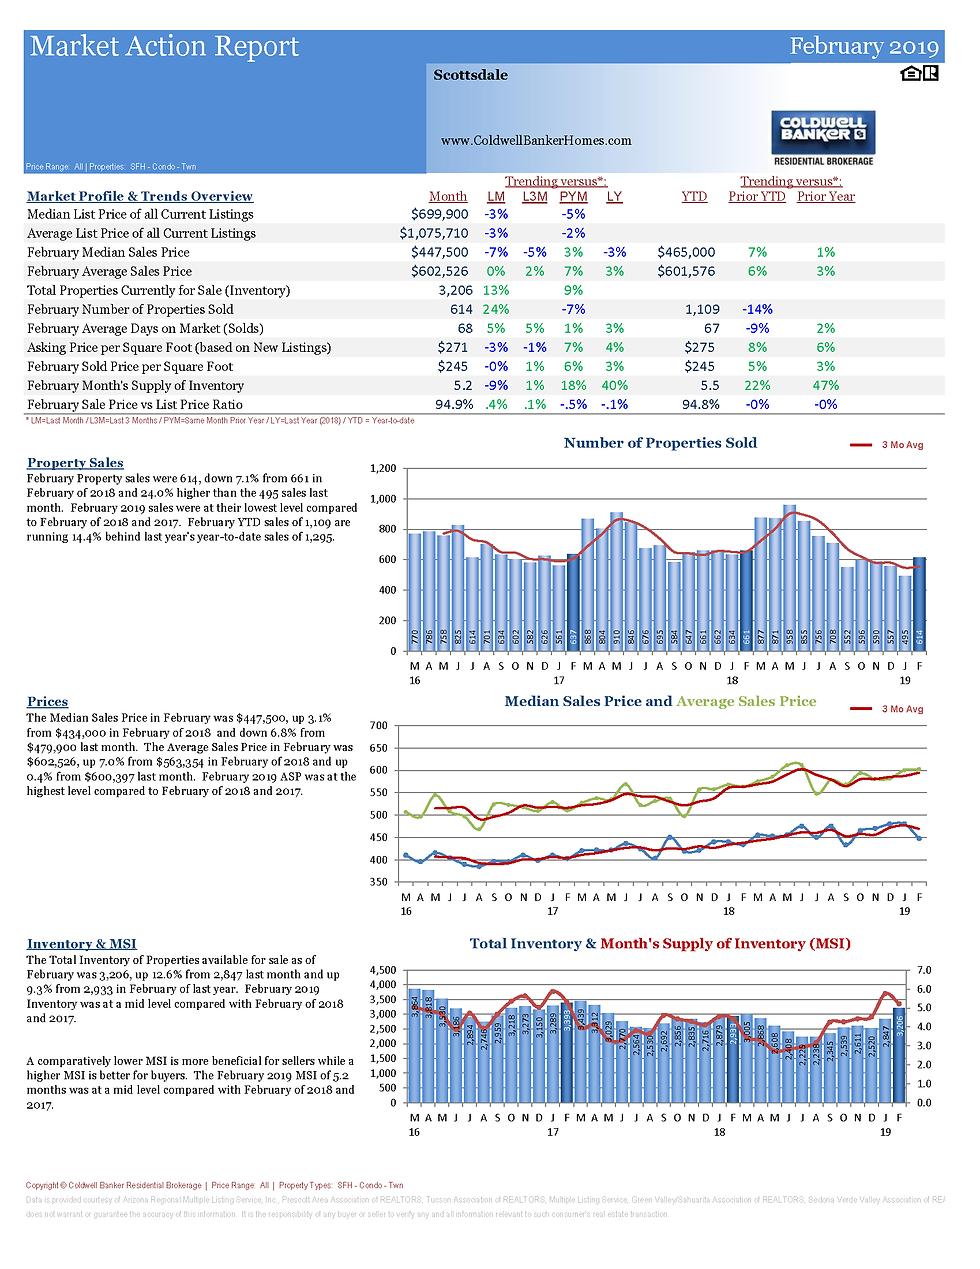 MarketActionReportScottsdale_Page_1.png